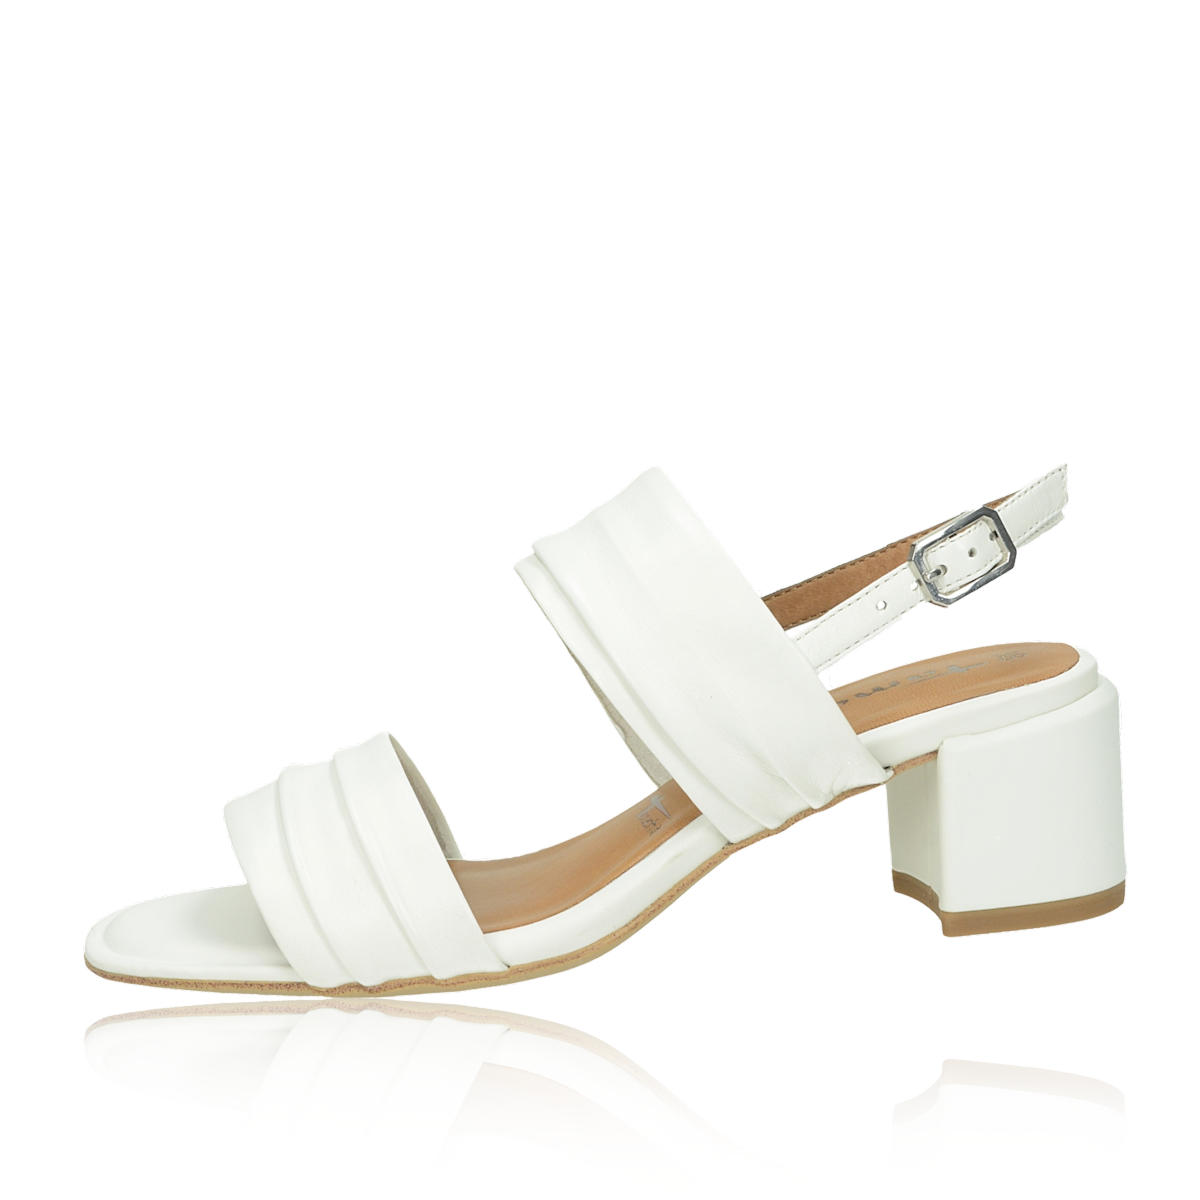 6ae30fa1f1af Tamaris dámské stylové sandály - bílé Tamaris dámské stylové sandály - bílé  ...